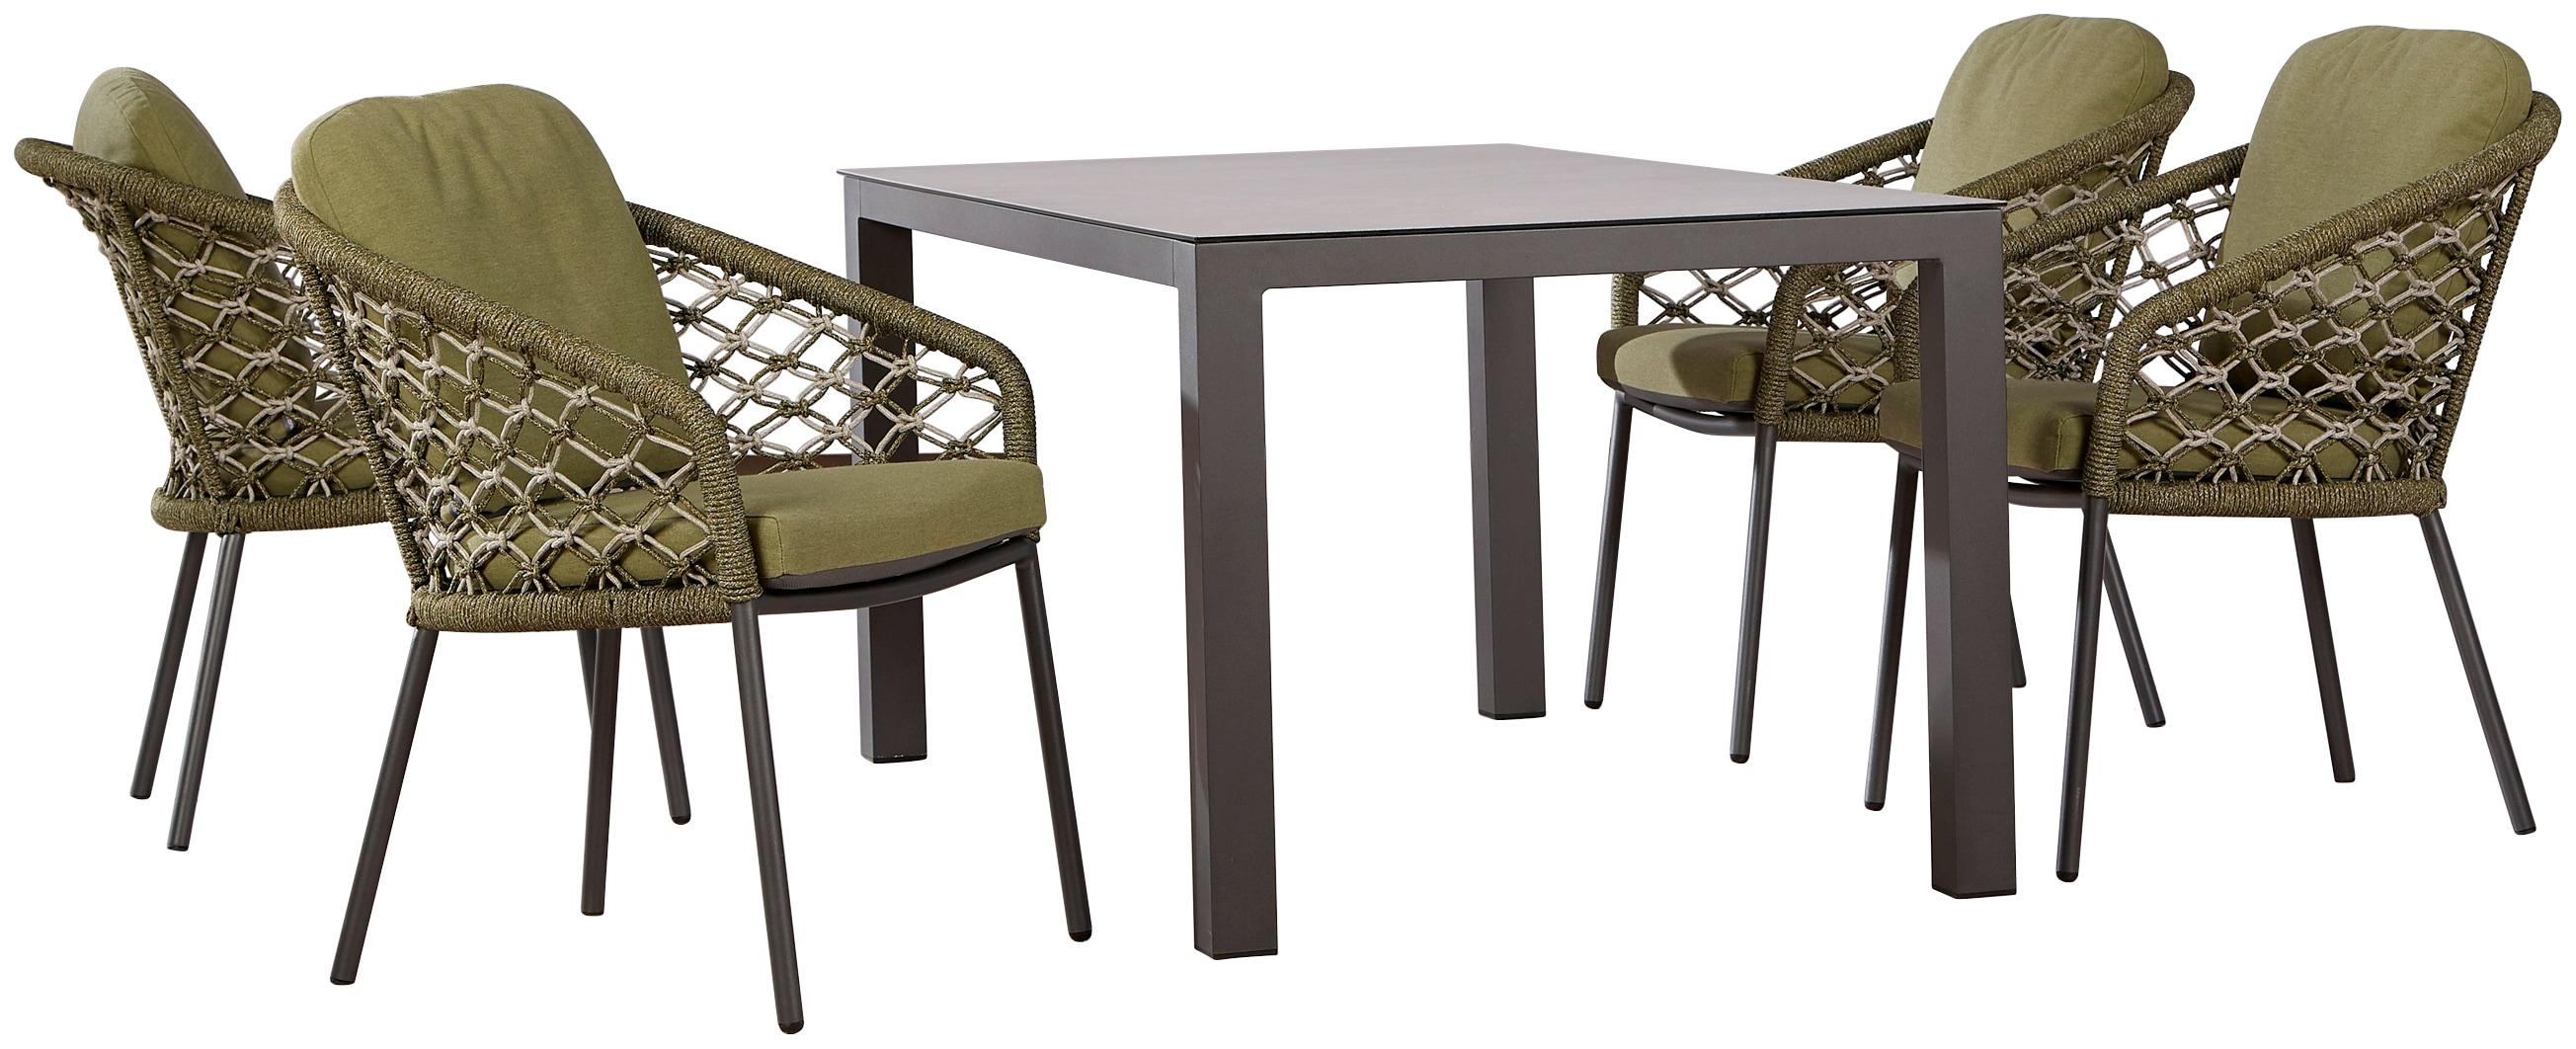 BEST Gartenmöbelset Mali 4 Sessel Tisch 160x90 cm